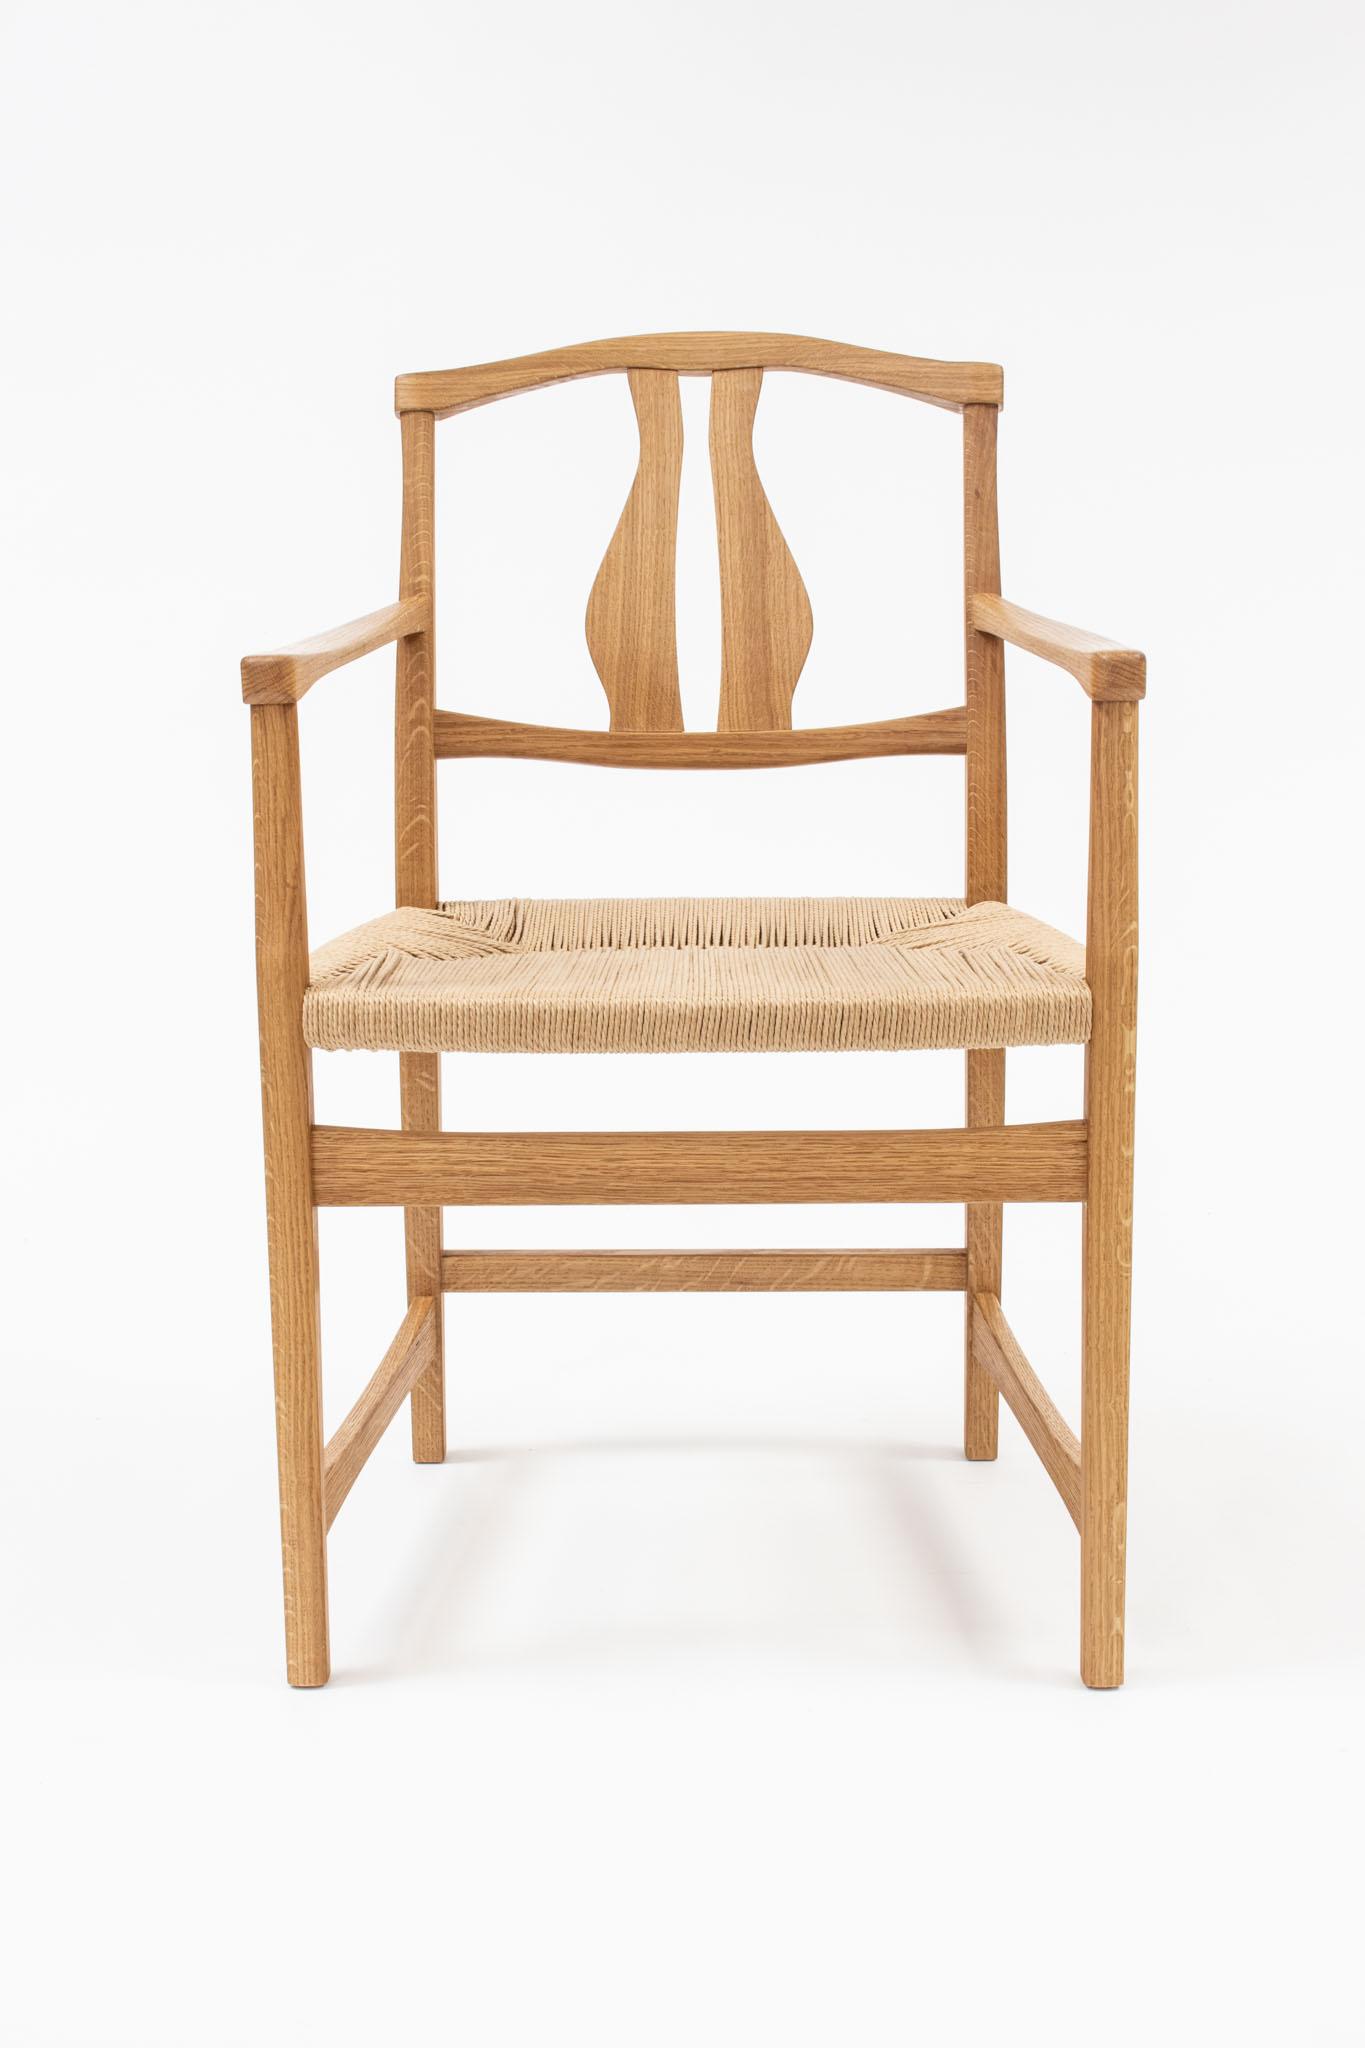 Irber Vidar chair